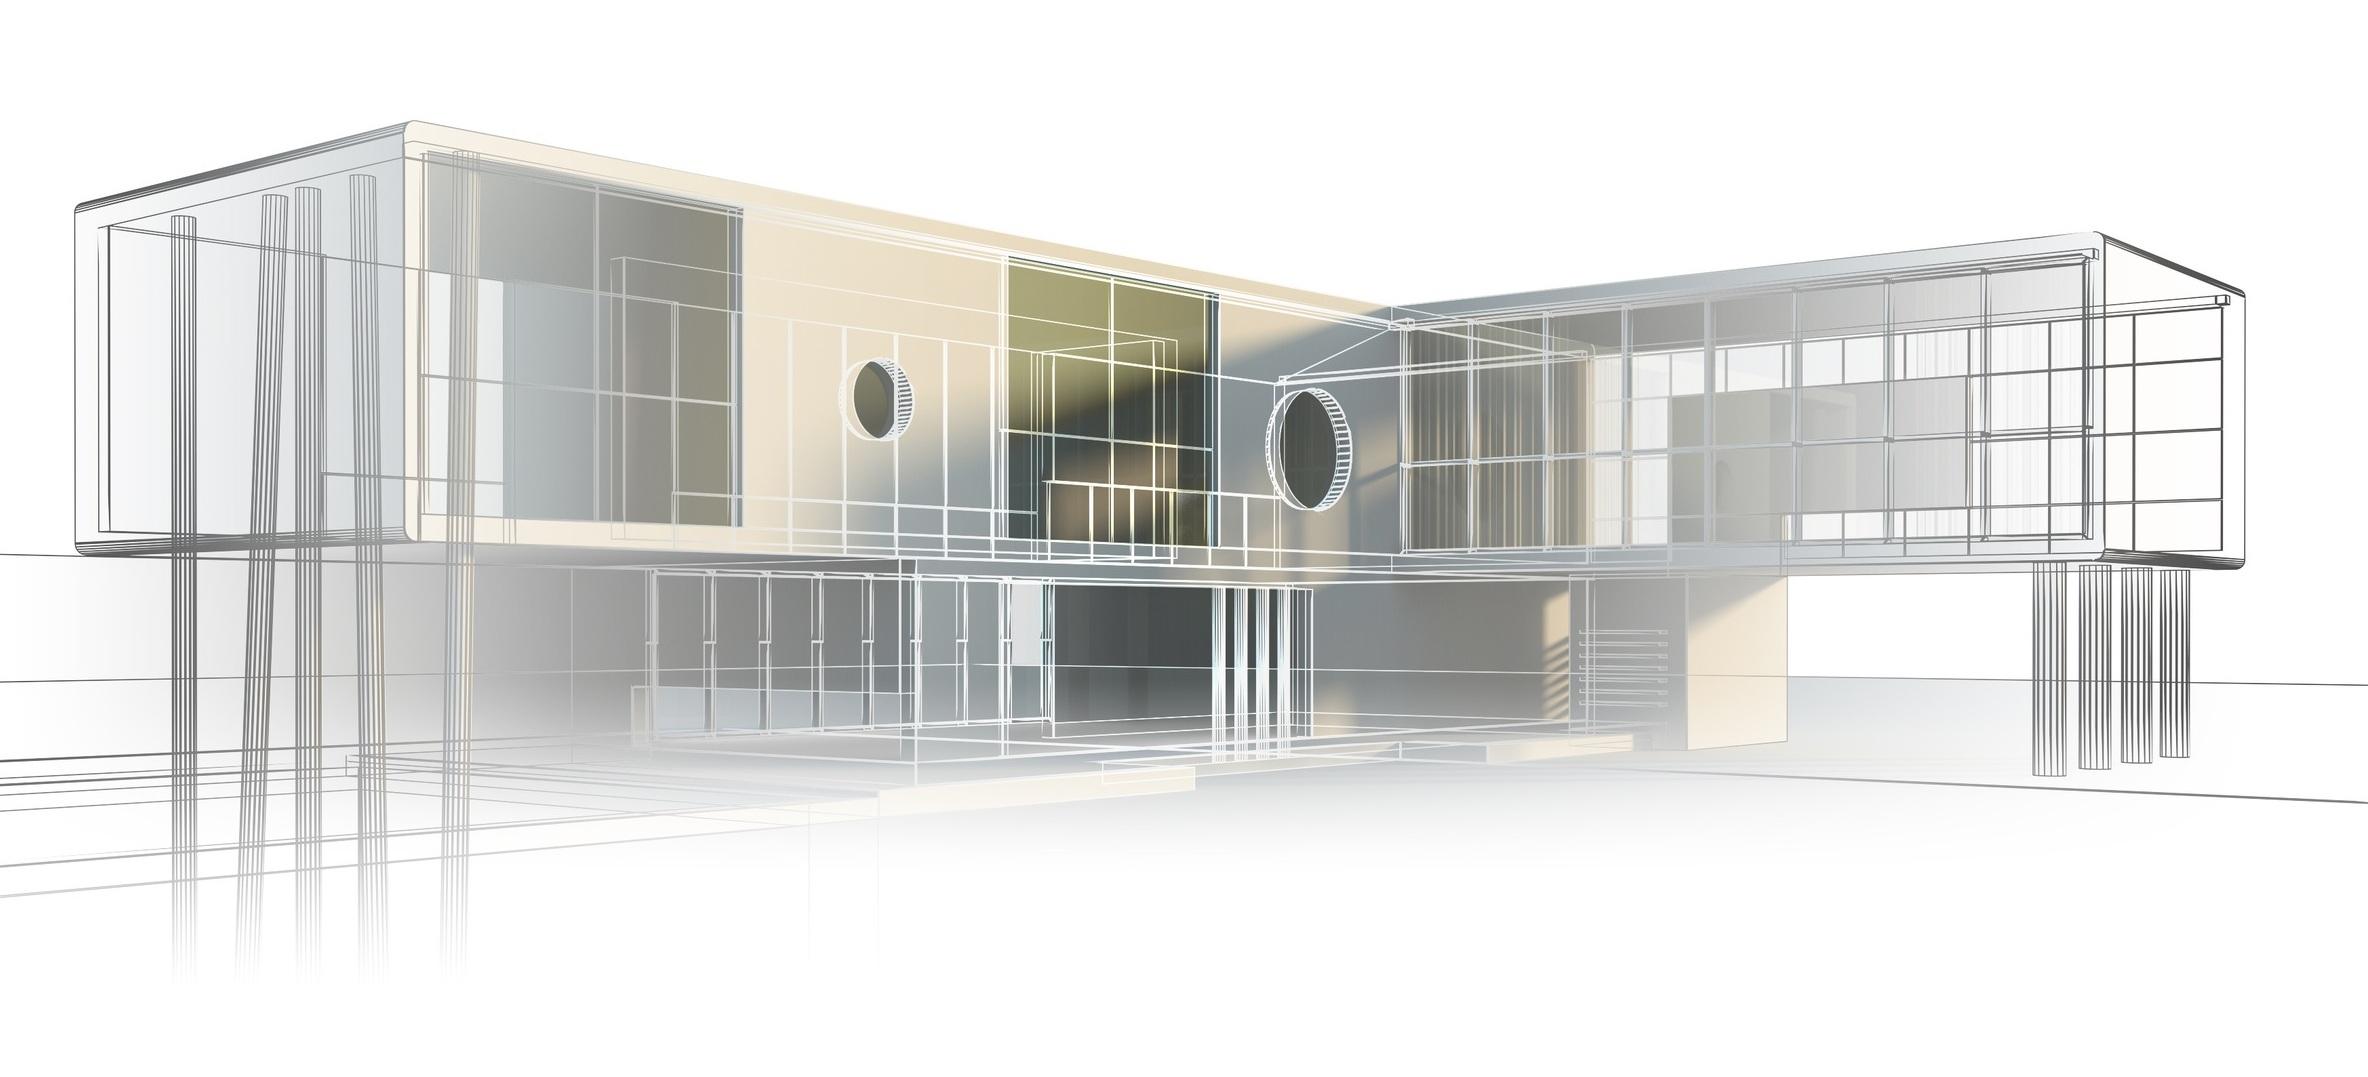 Comment construire en zone verte for Agrandissement maison zone verte